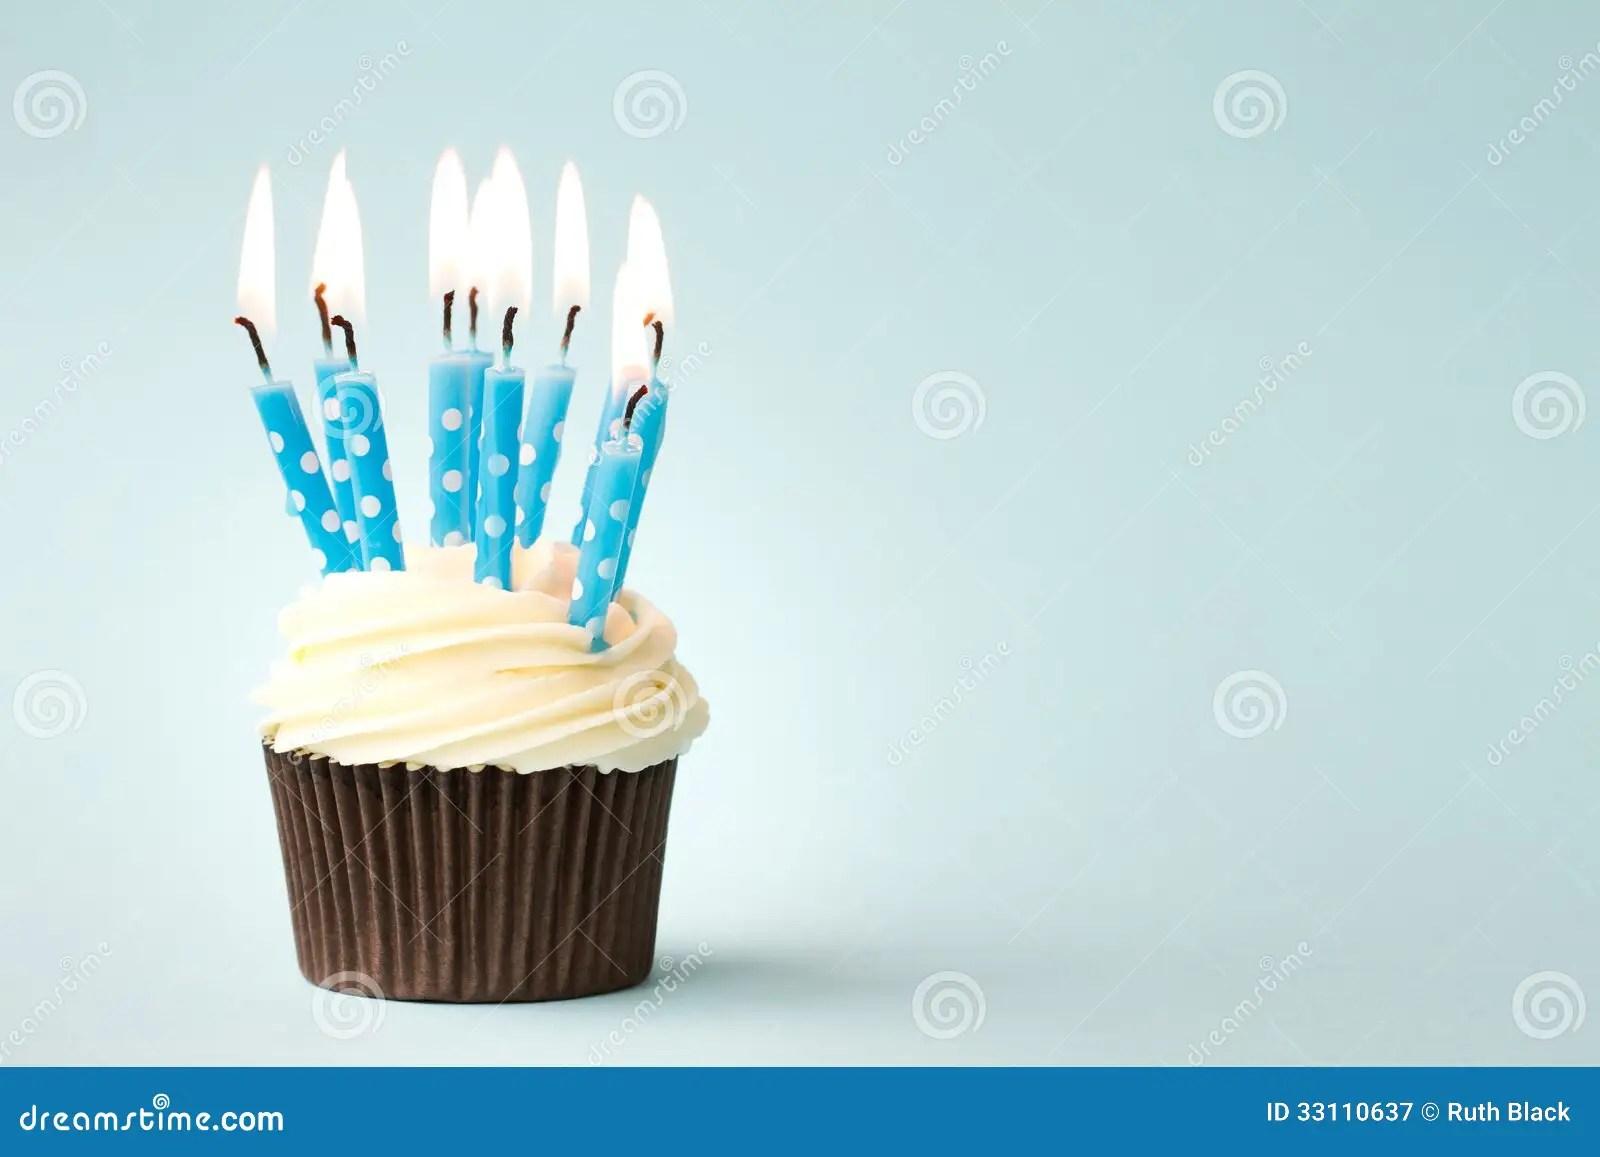 Birthday Cupcake Royalty Free Stock Photography Image